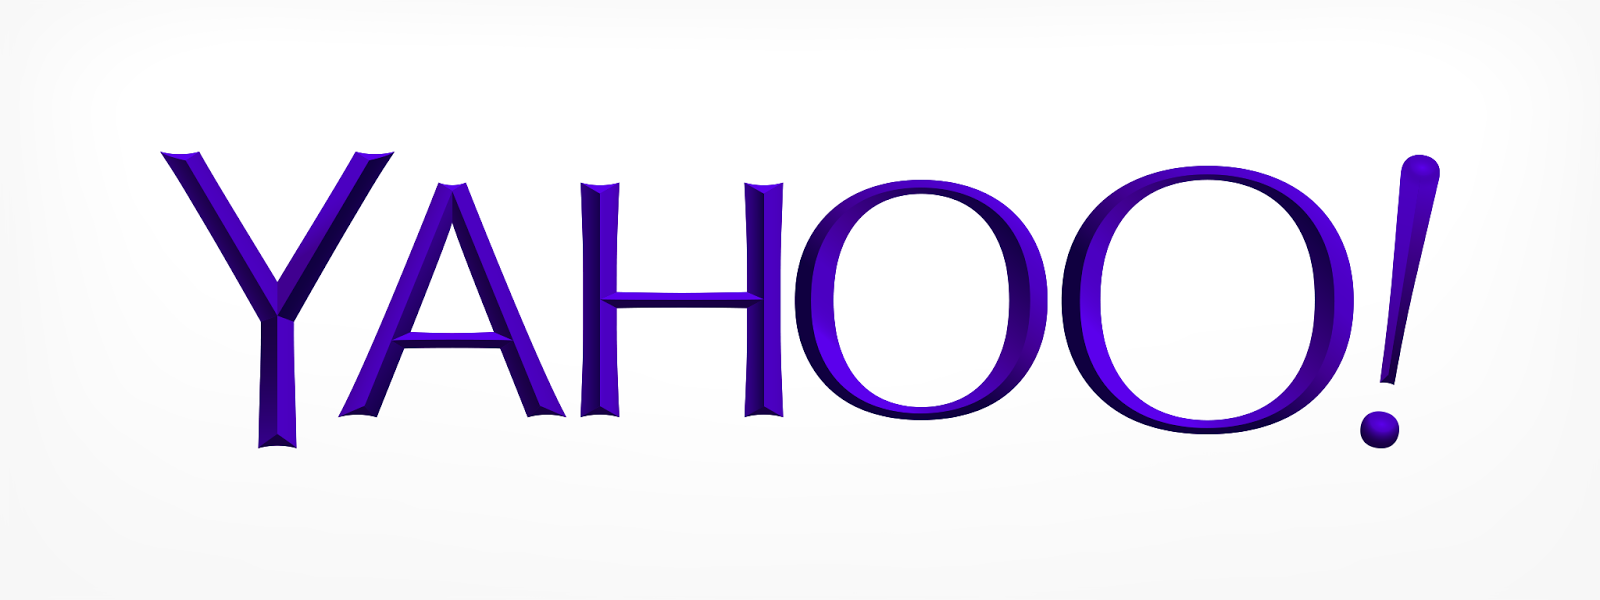 Business Ethics Case Analyses Scott Thompson Vs Yahoo Inc